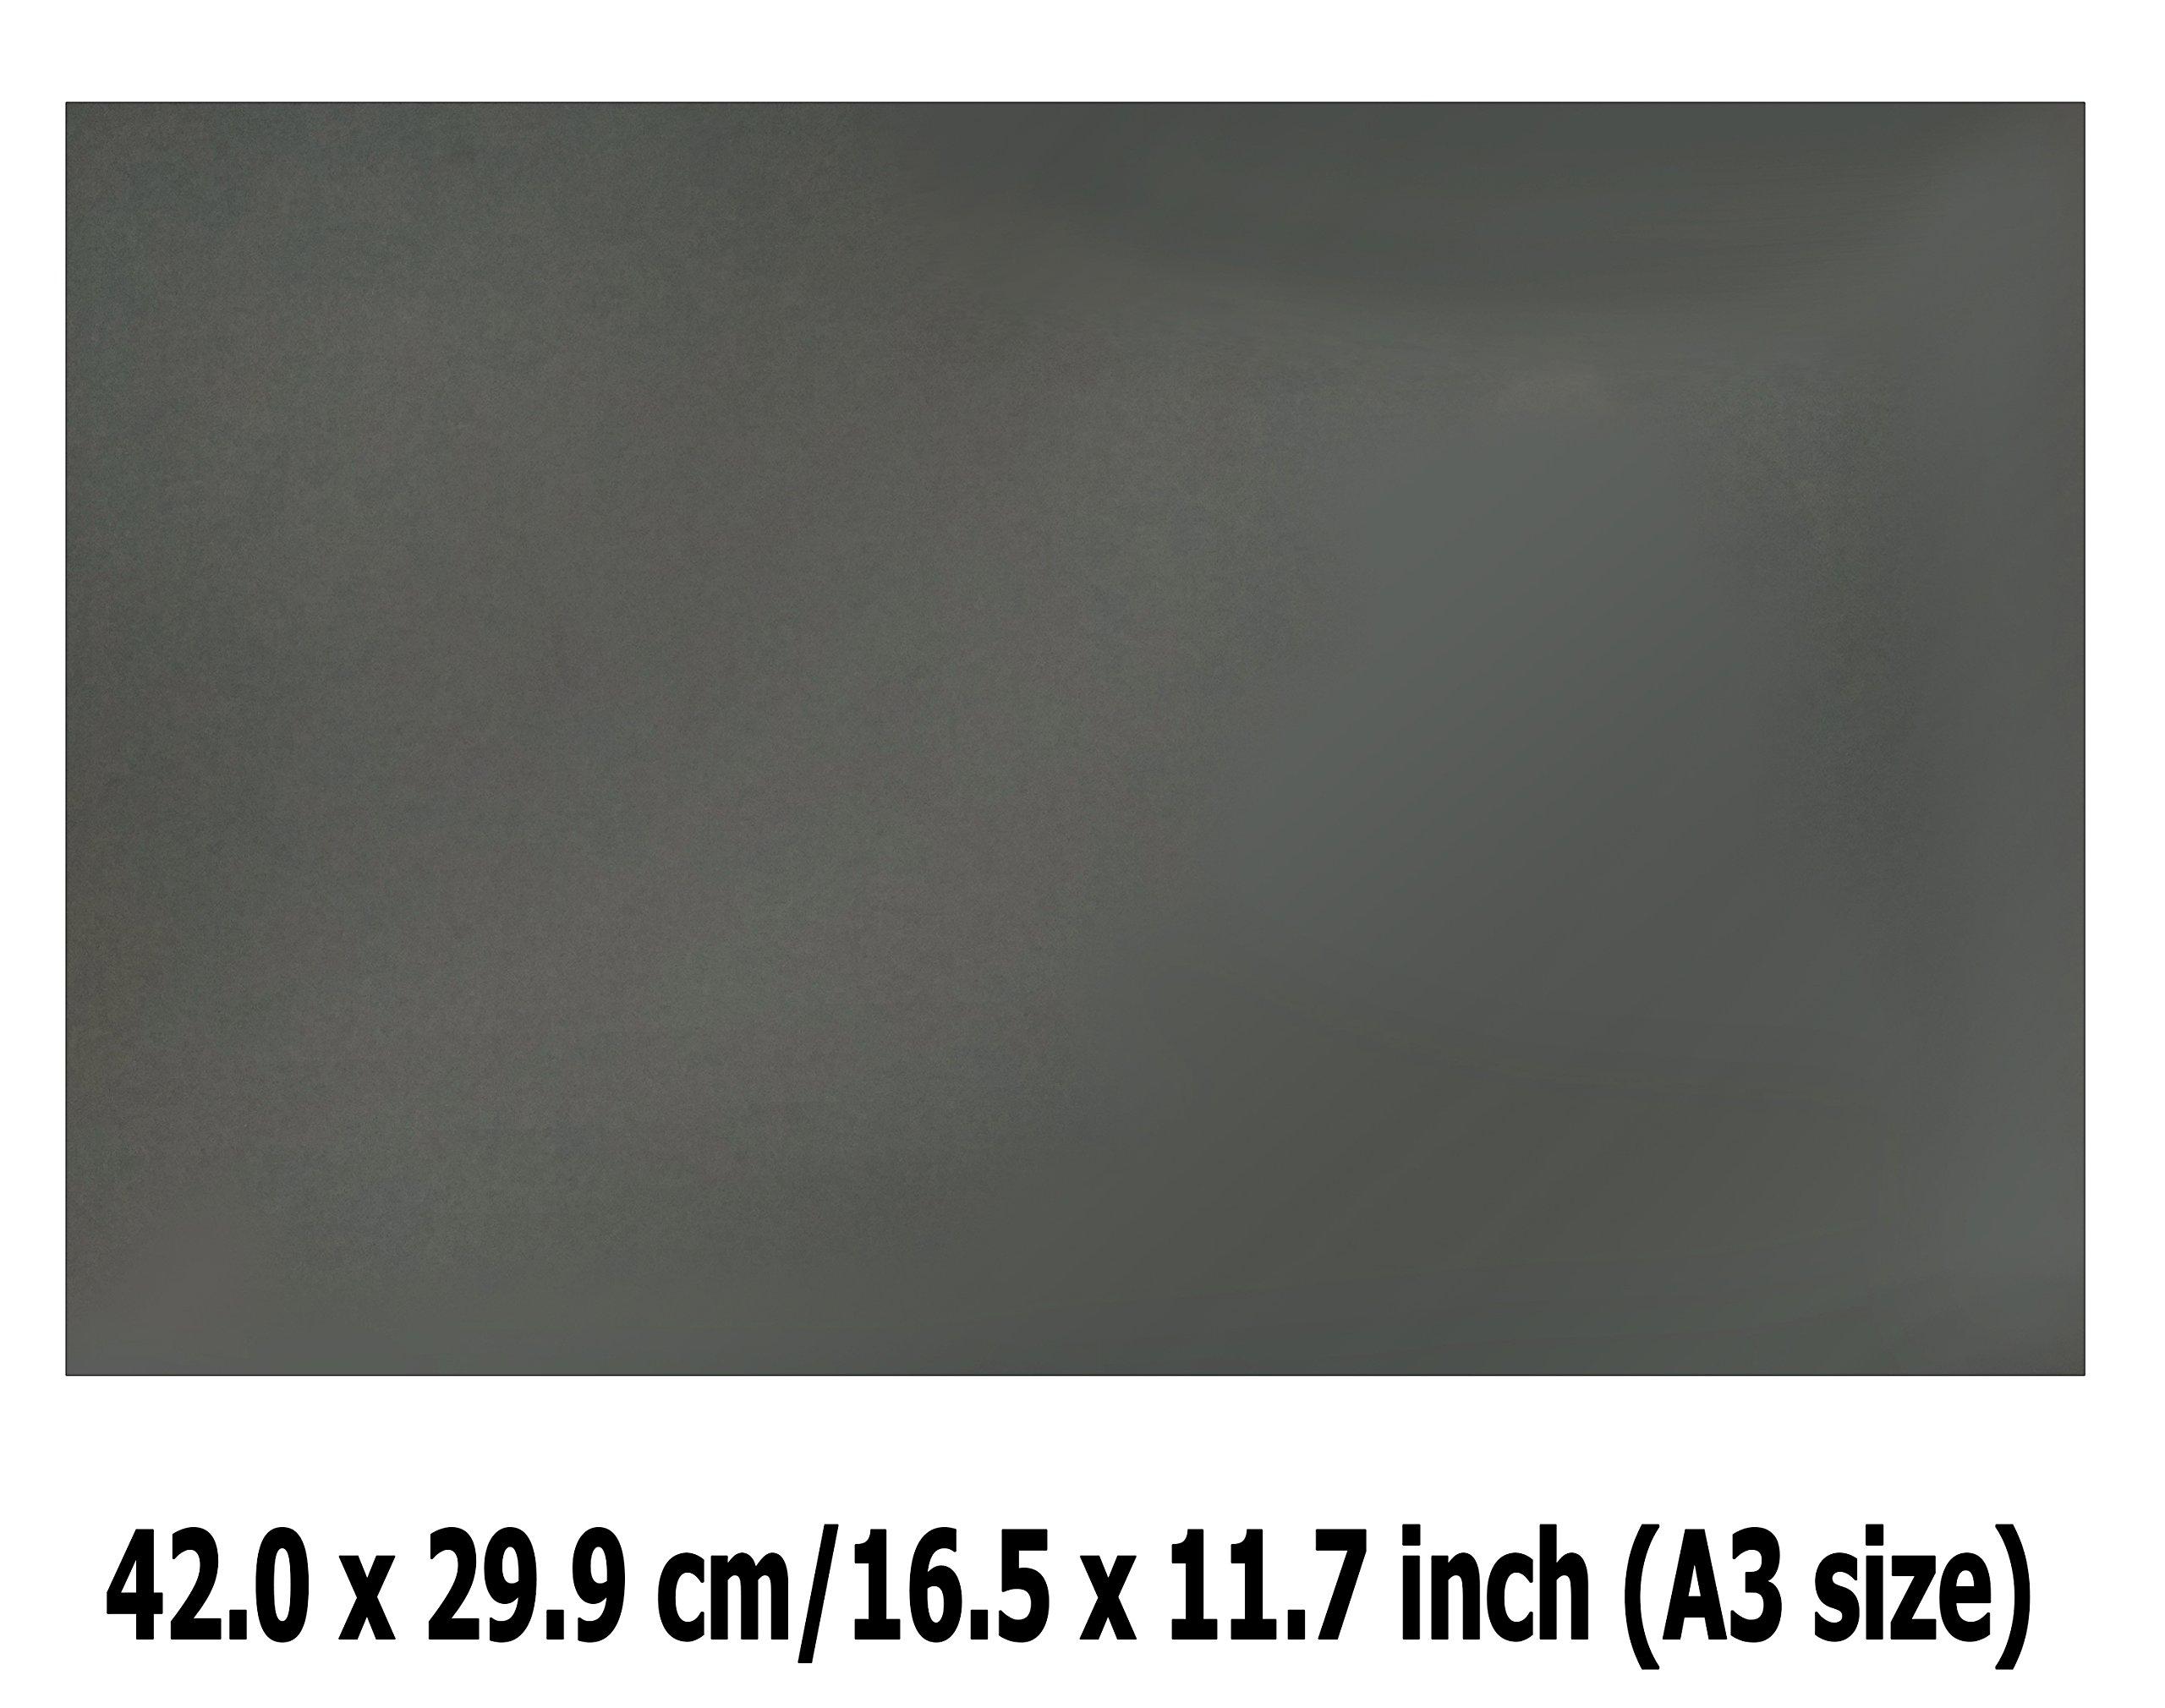 Linear Polarization A3 Sheet Polarizer Educational Physics Polarized Filter Optical